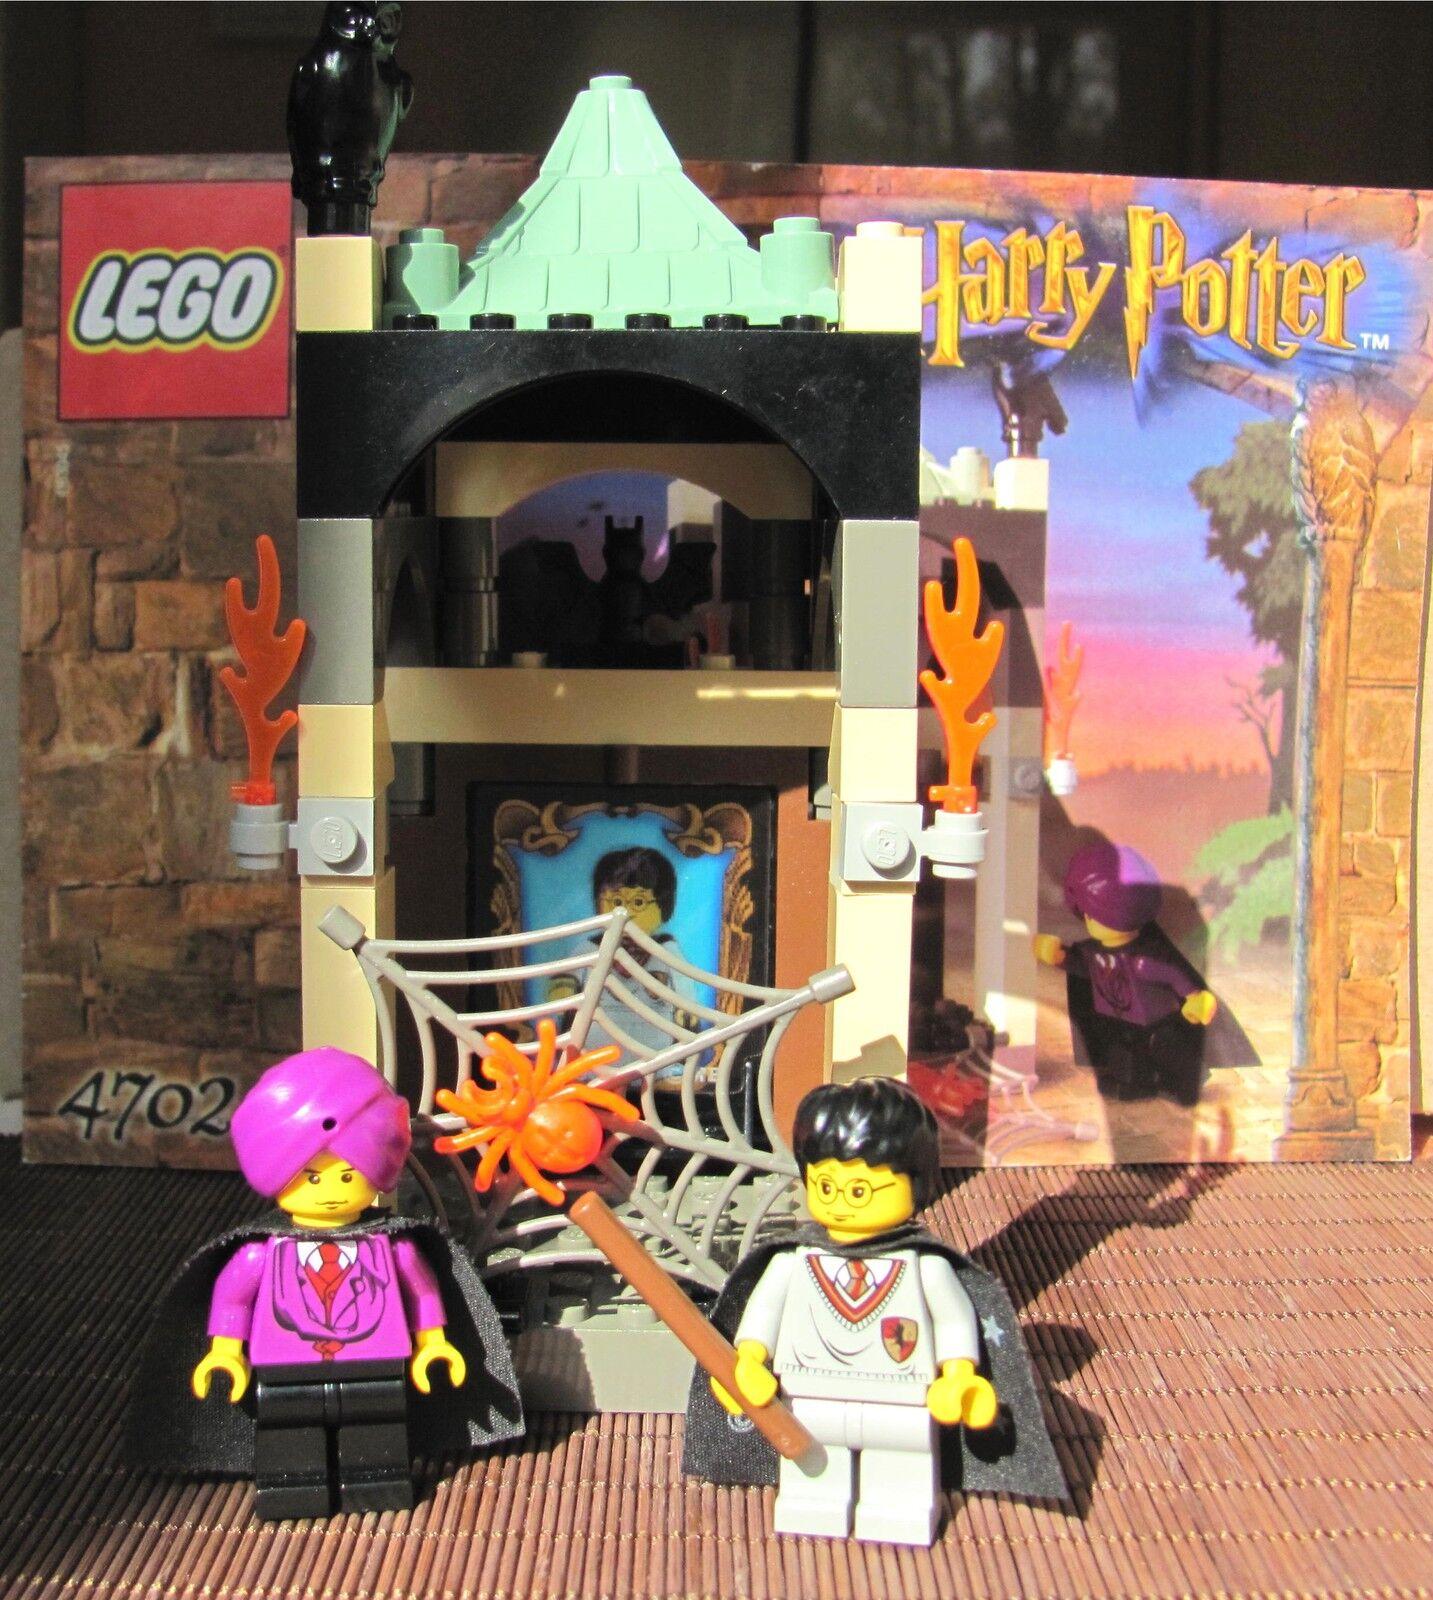 LEGO Harry Potter Set 4702 u BA inkl. 2 Fig Professor Quirell/Voldemort  Harry